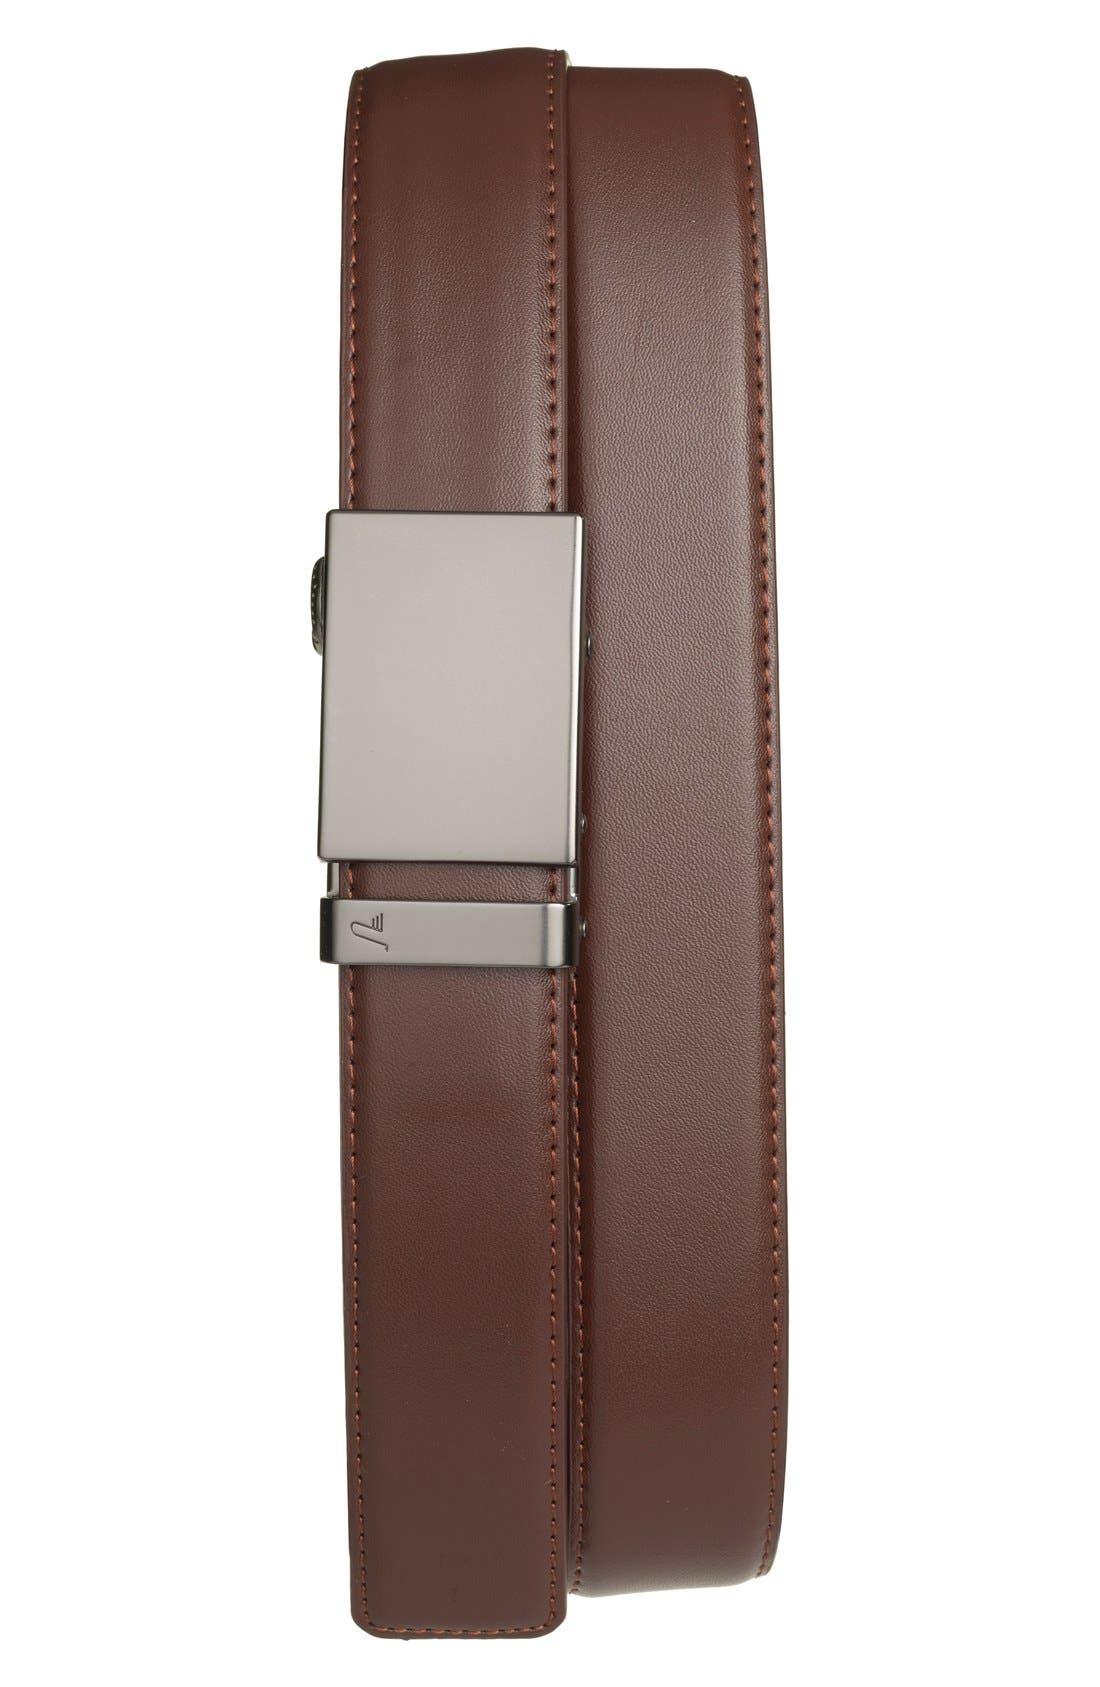 MISSION BELT 'Gun Metal' Leather Belt, Main, color, GUNMETAL/ CHOCOLATE